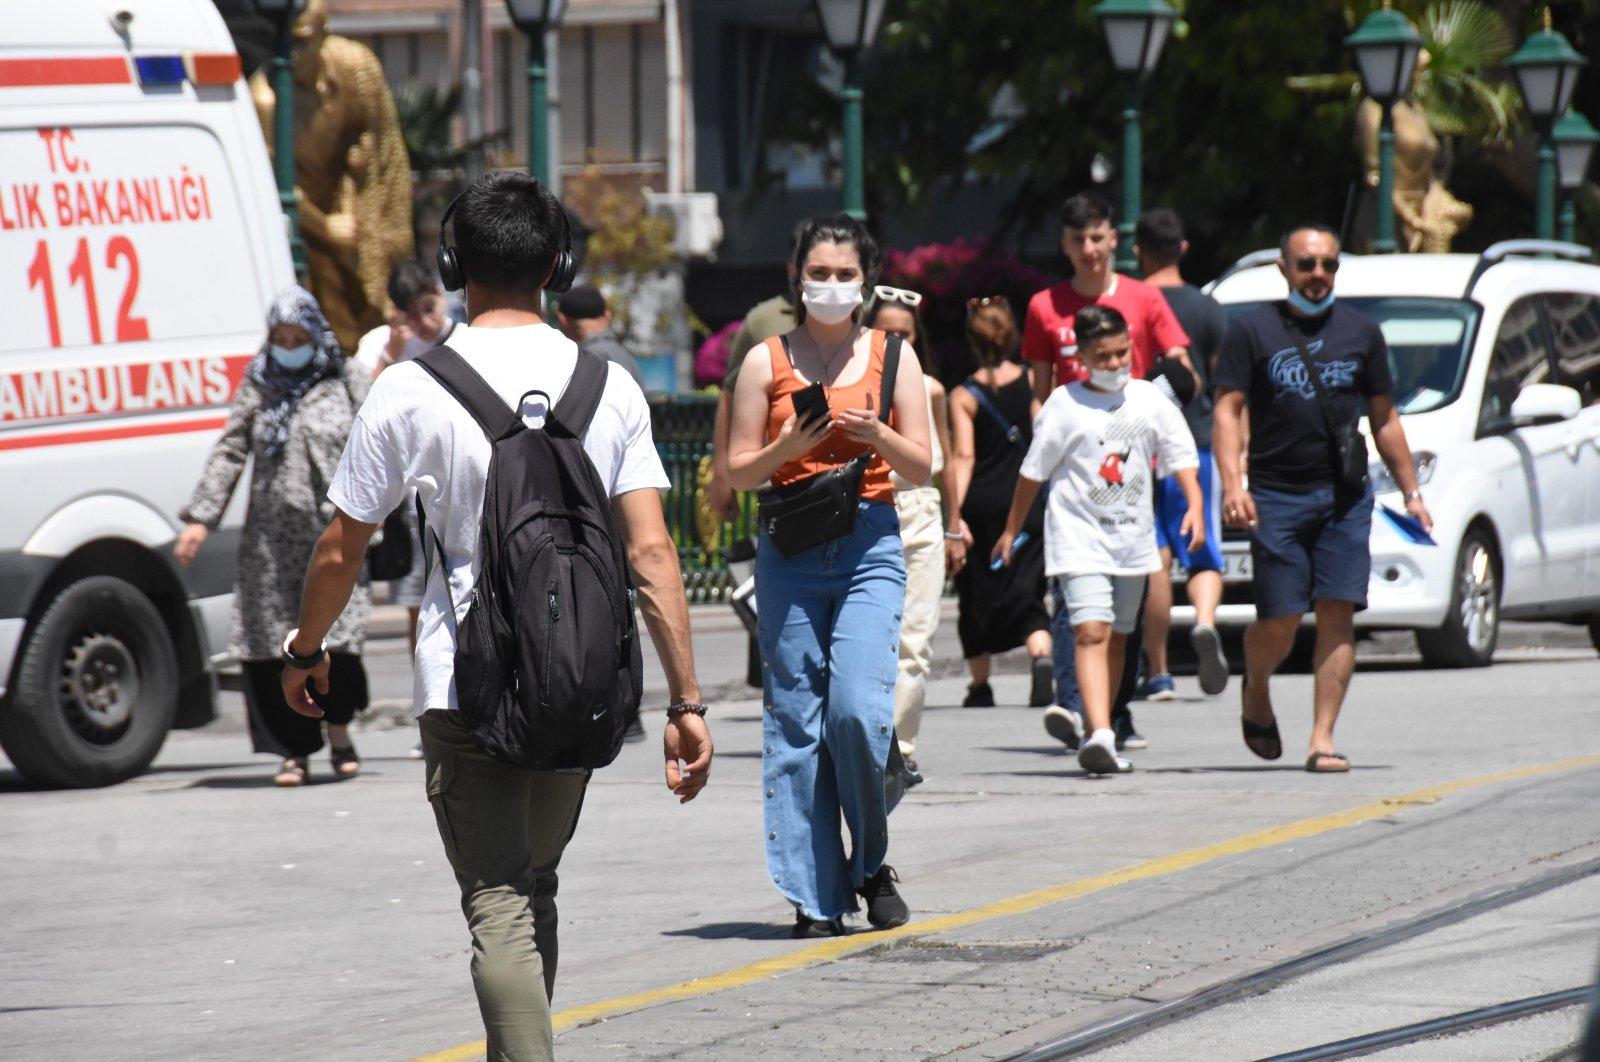 People wearing protective masks walk on a street, in Eskişehir, central Turkey, Aug. 28, 2021. (DHA Photo)